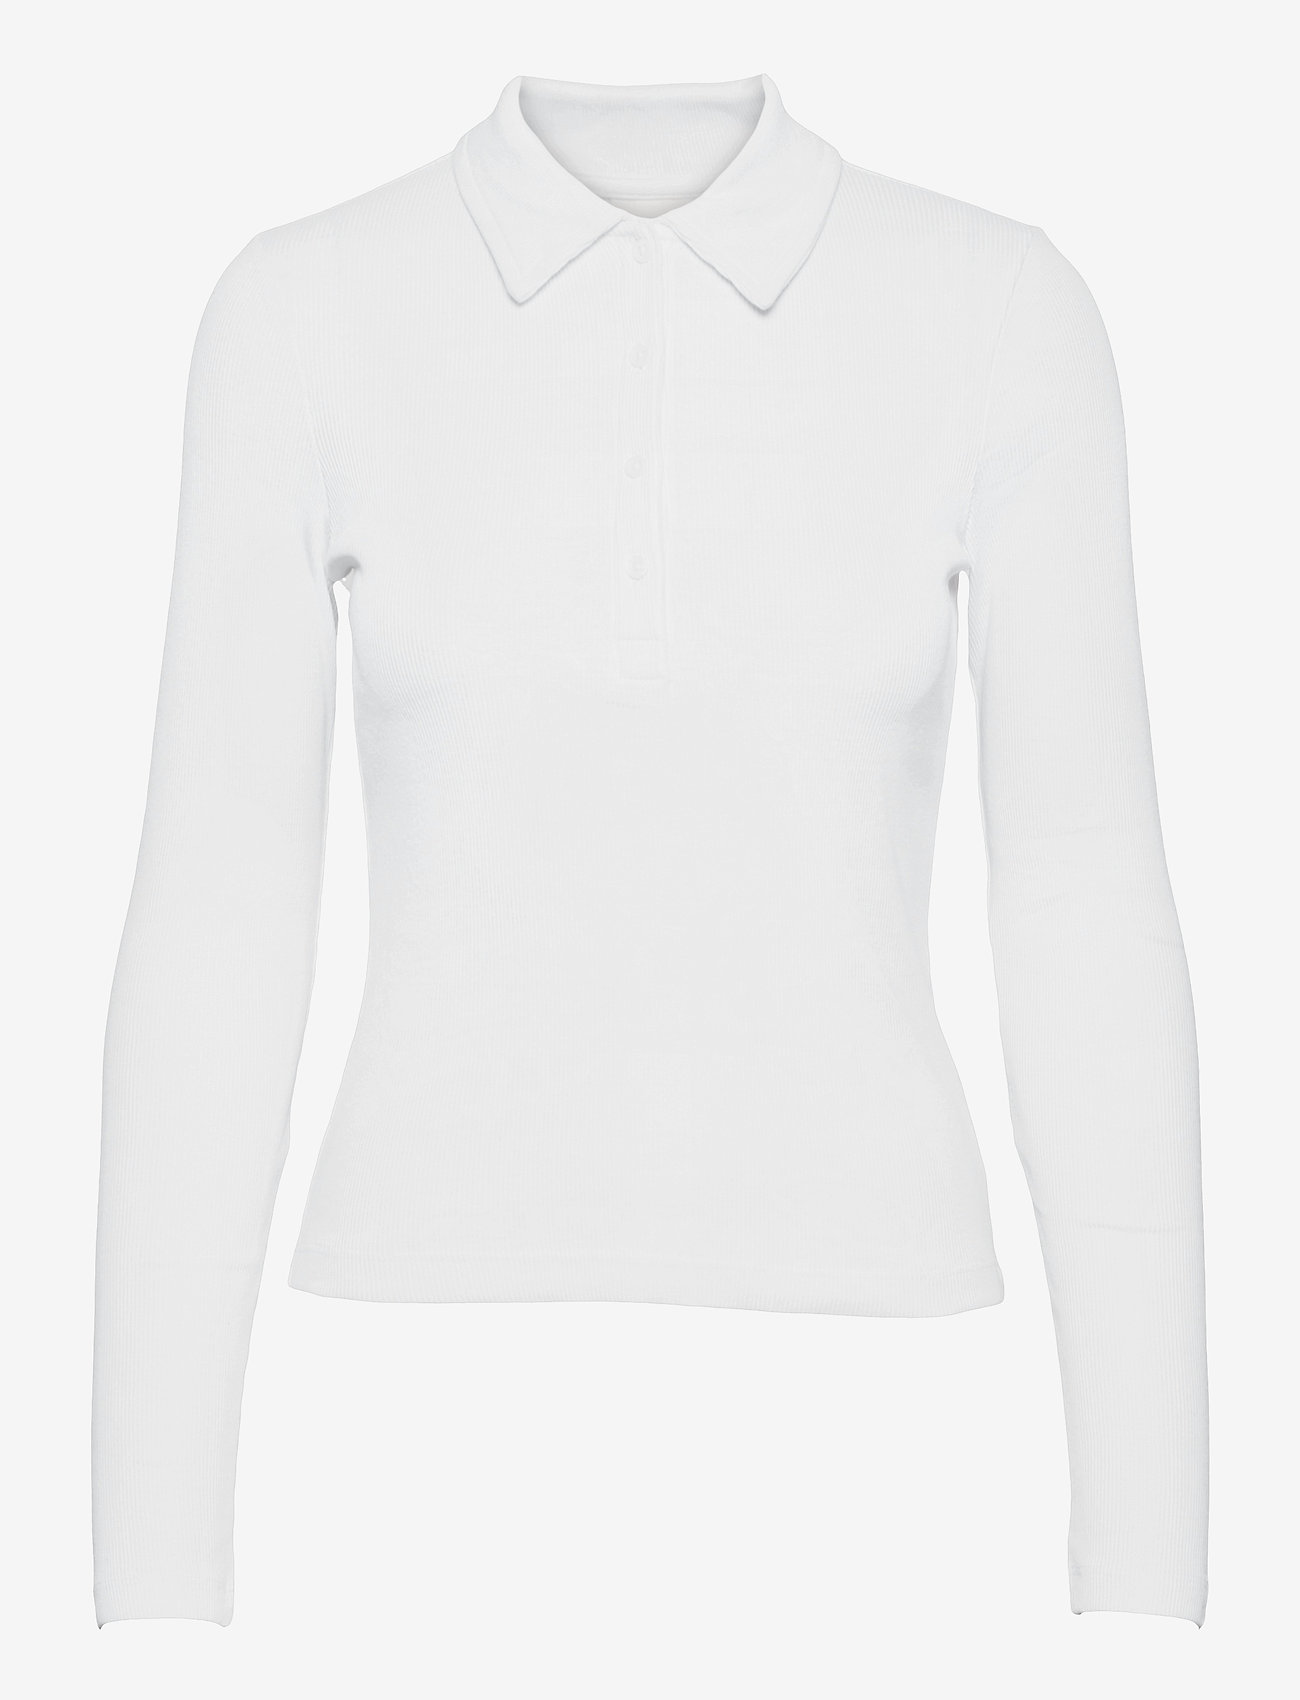 Gina Tricot - Bea top - polohemden - white (1000) - 0